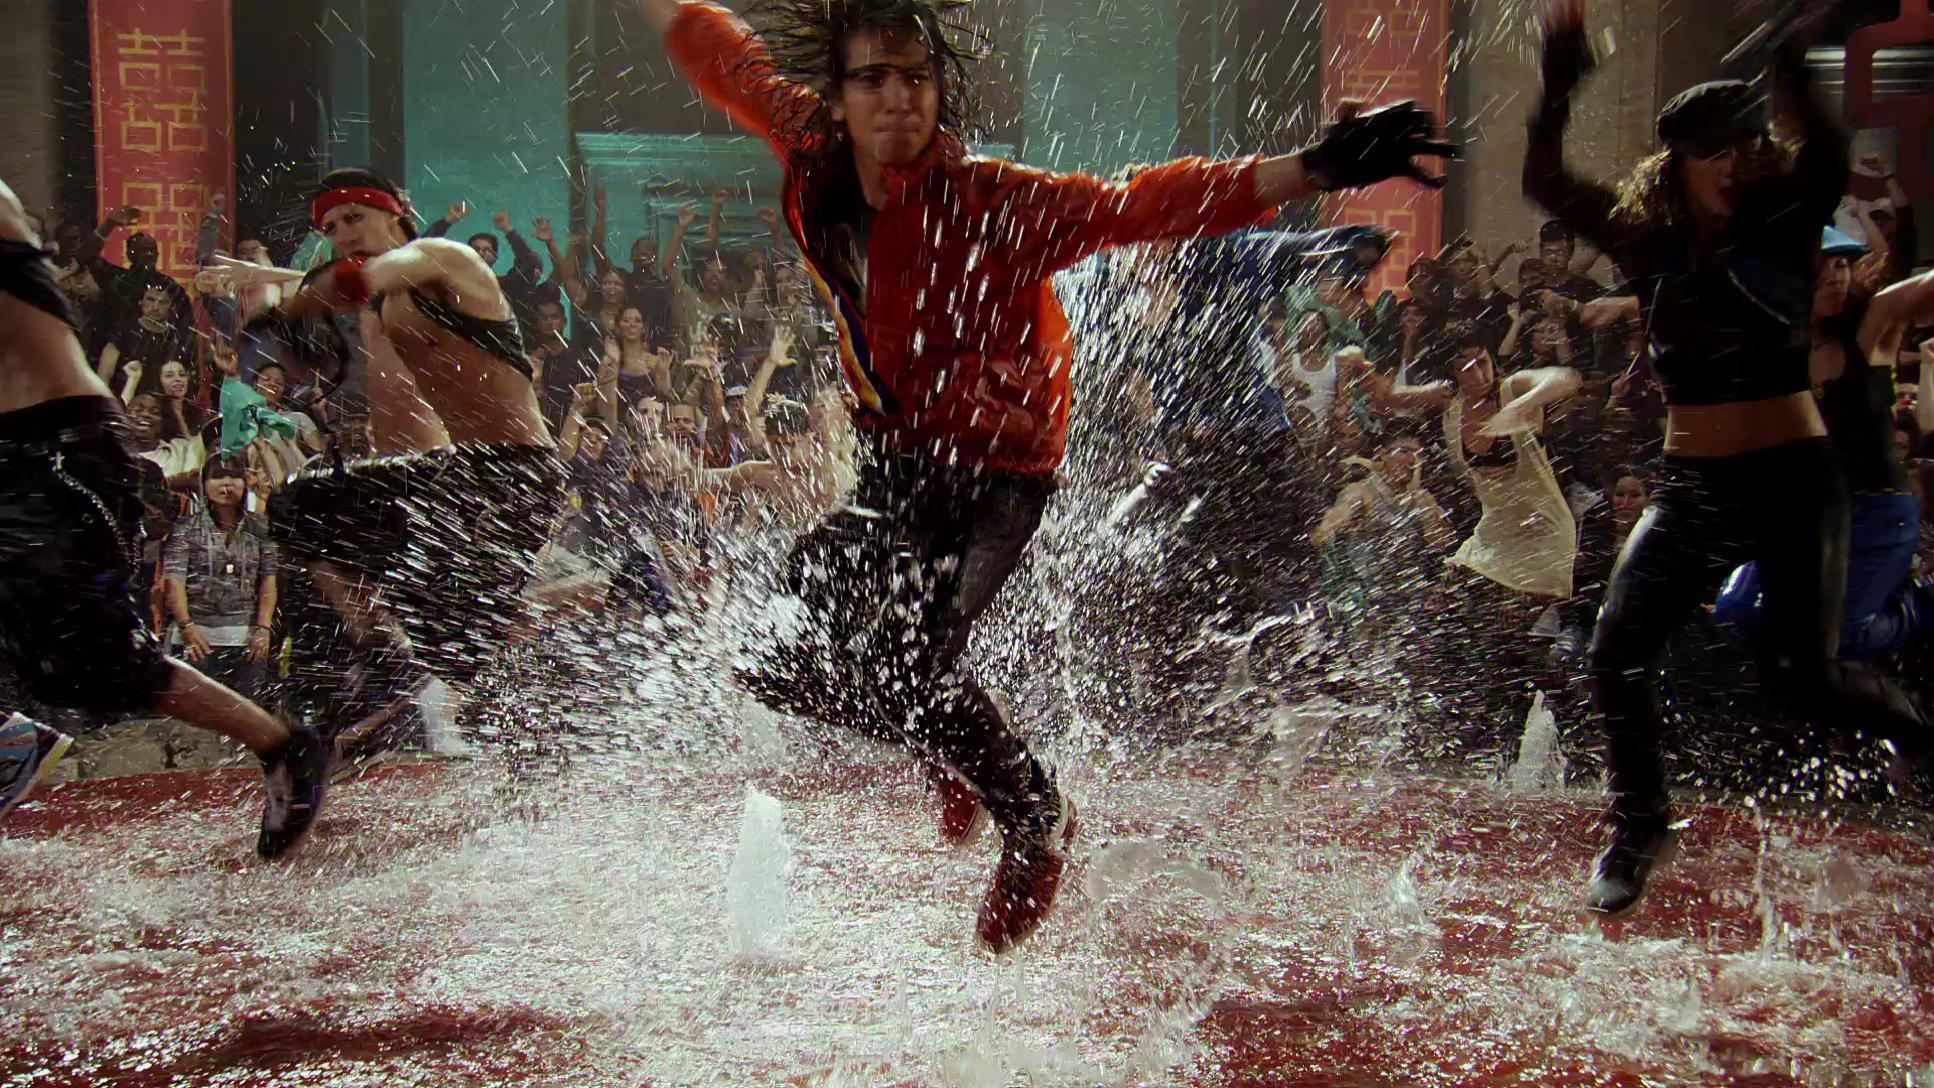 water dance adam sevani dating